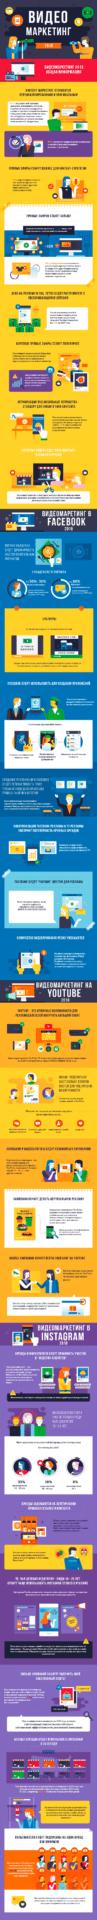 Видео маркетинг: тренды 2018 года. Инфографика